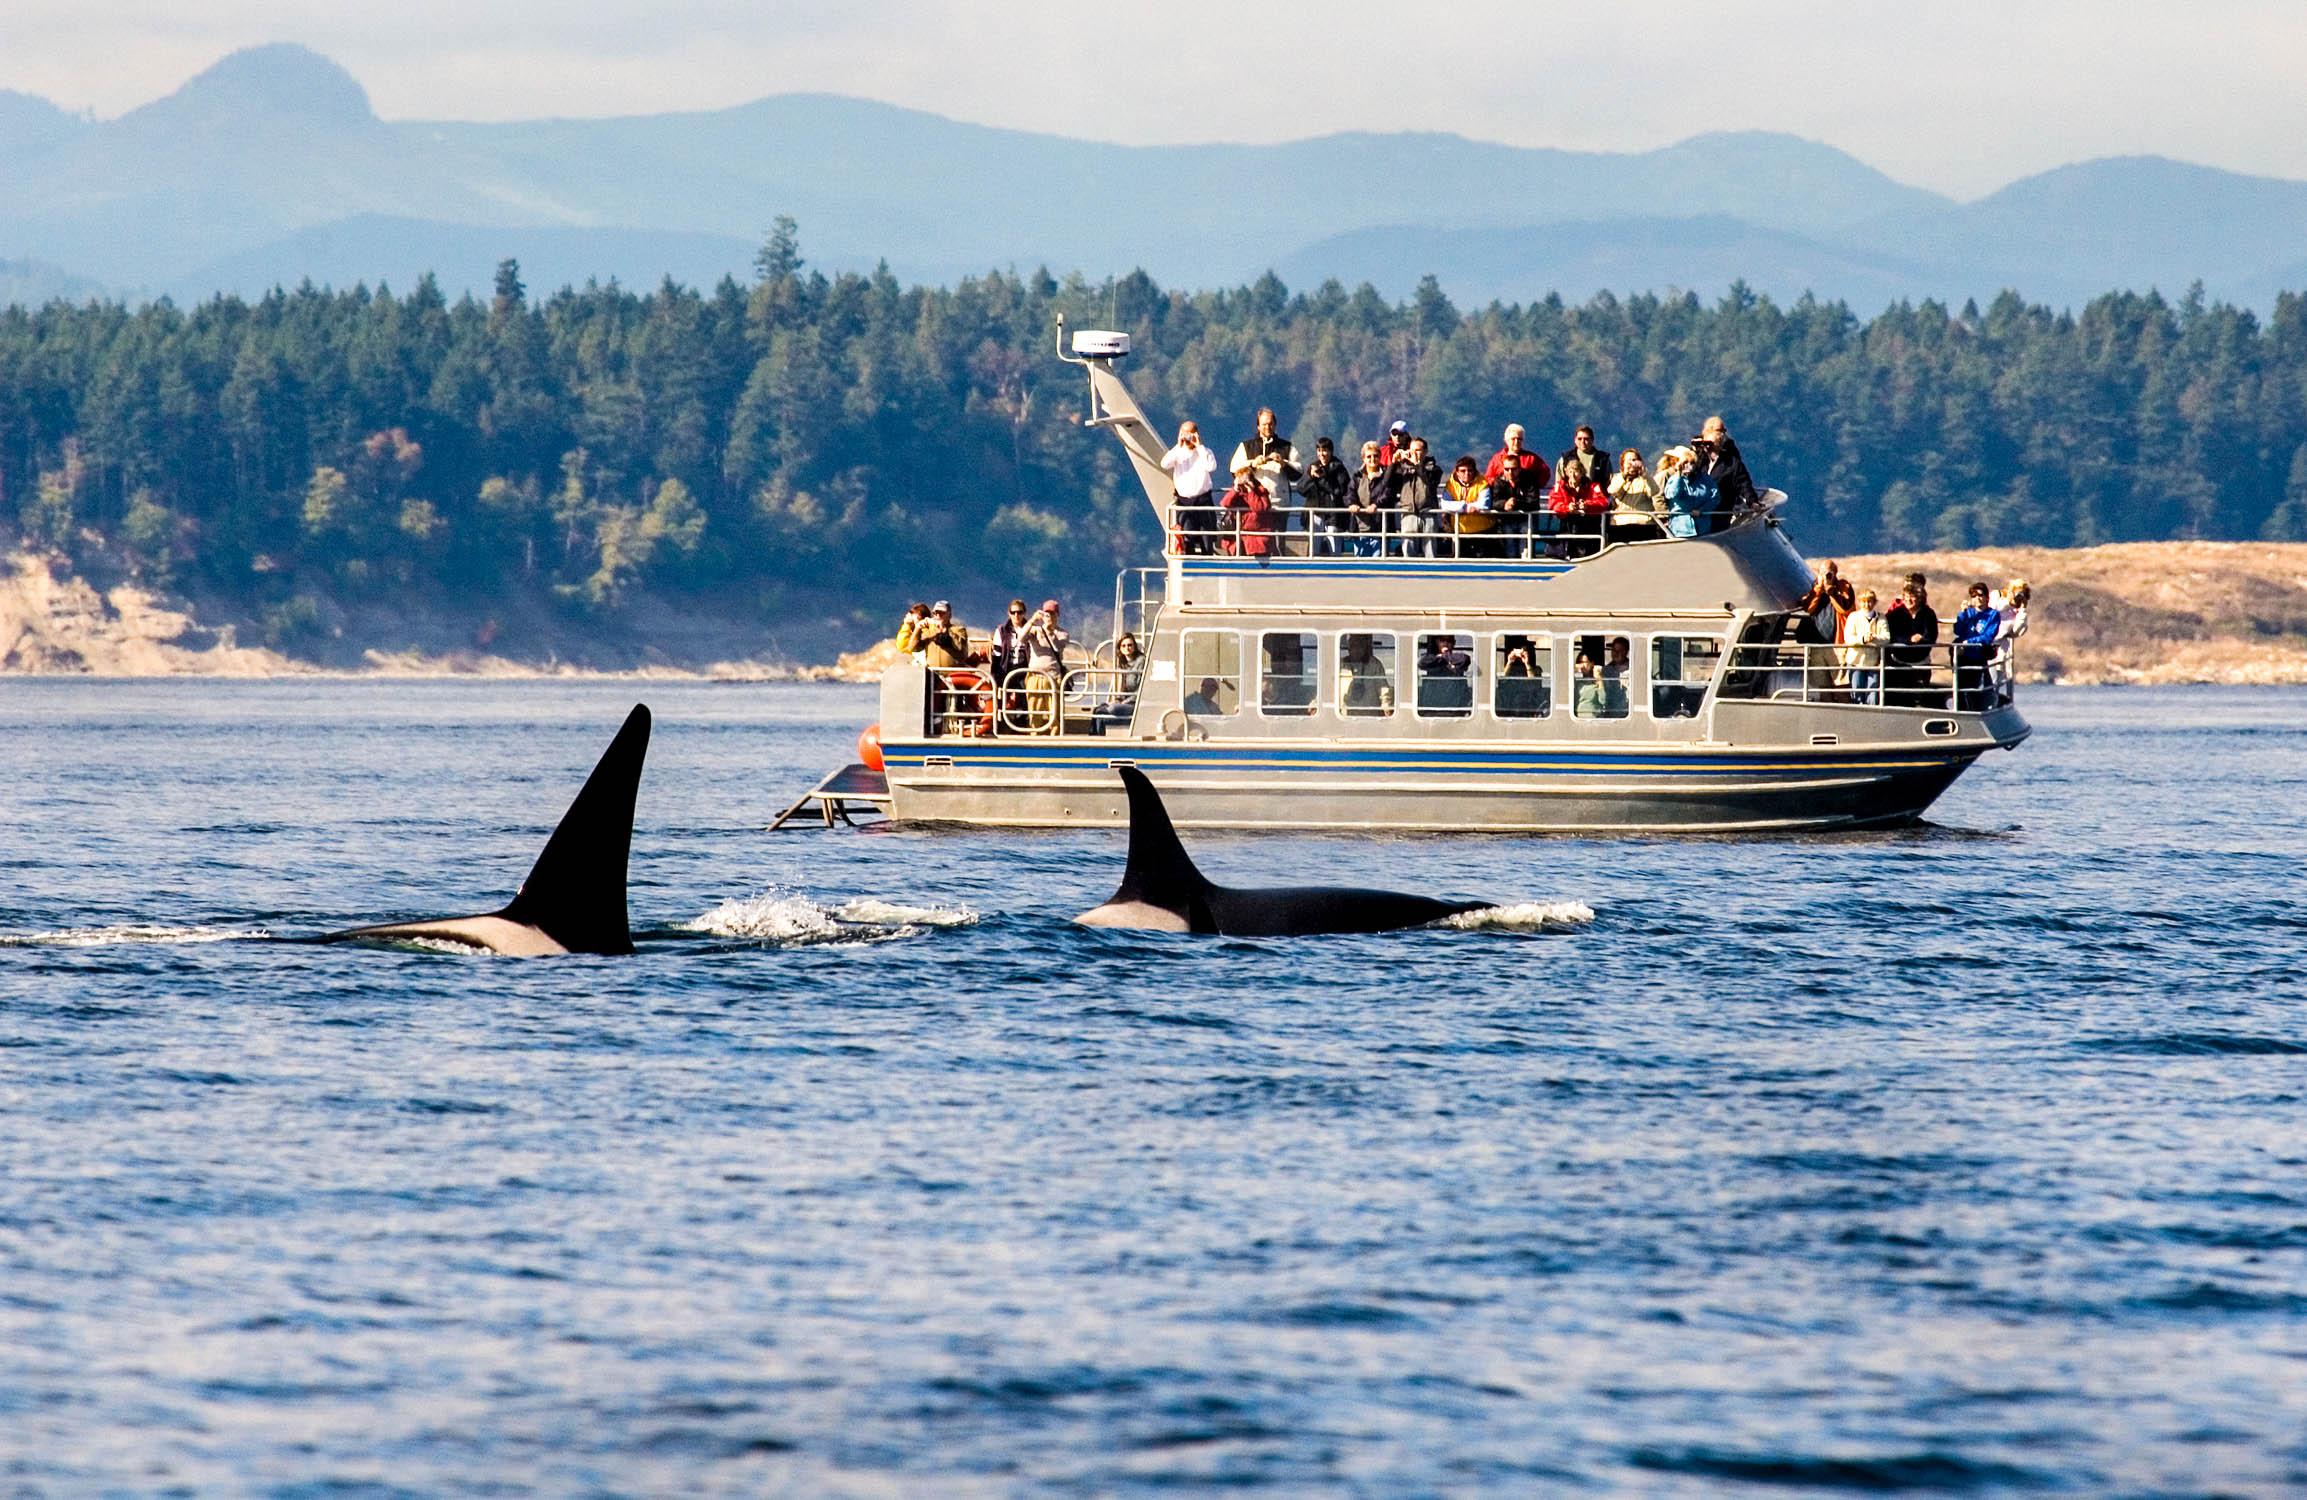 Vancouver Bc Tour Boat